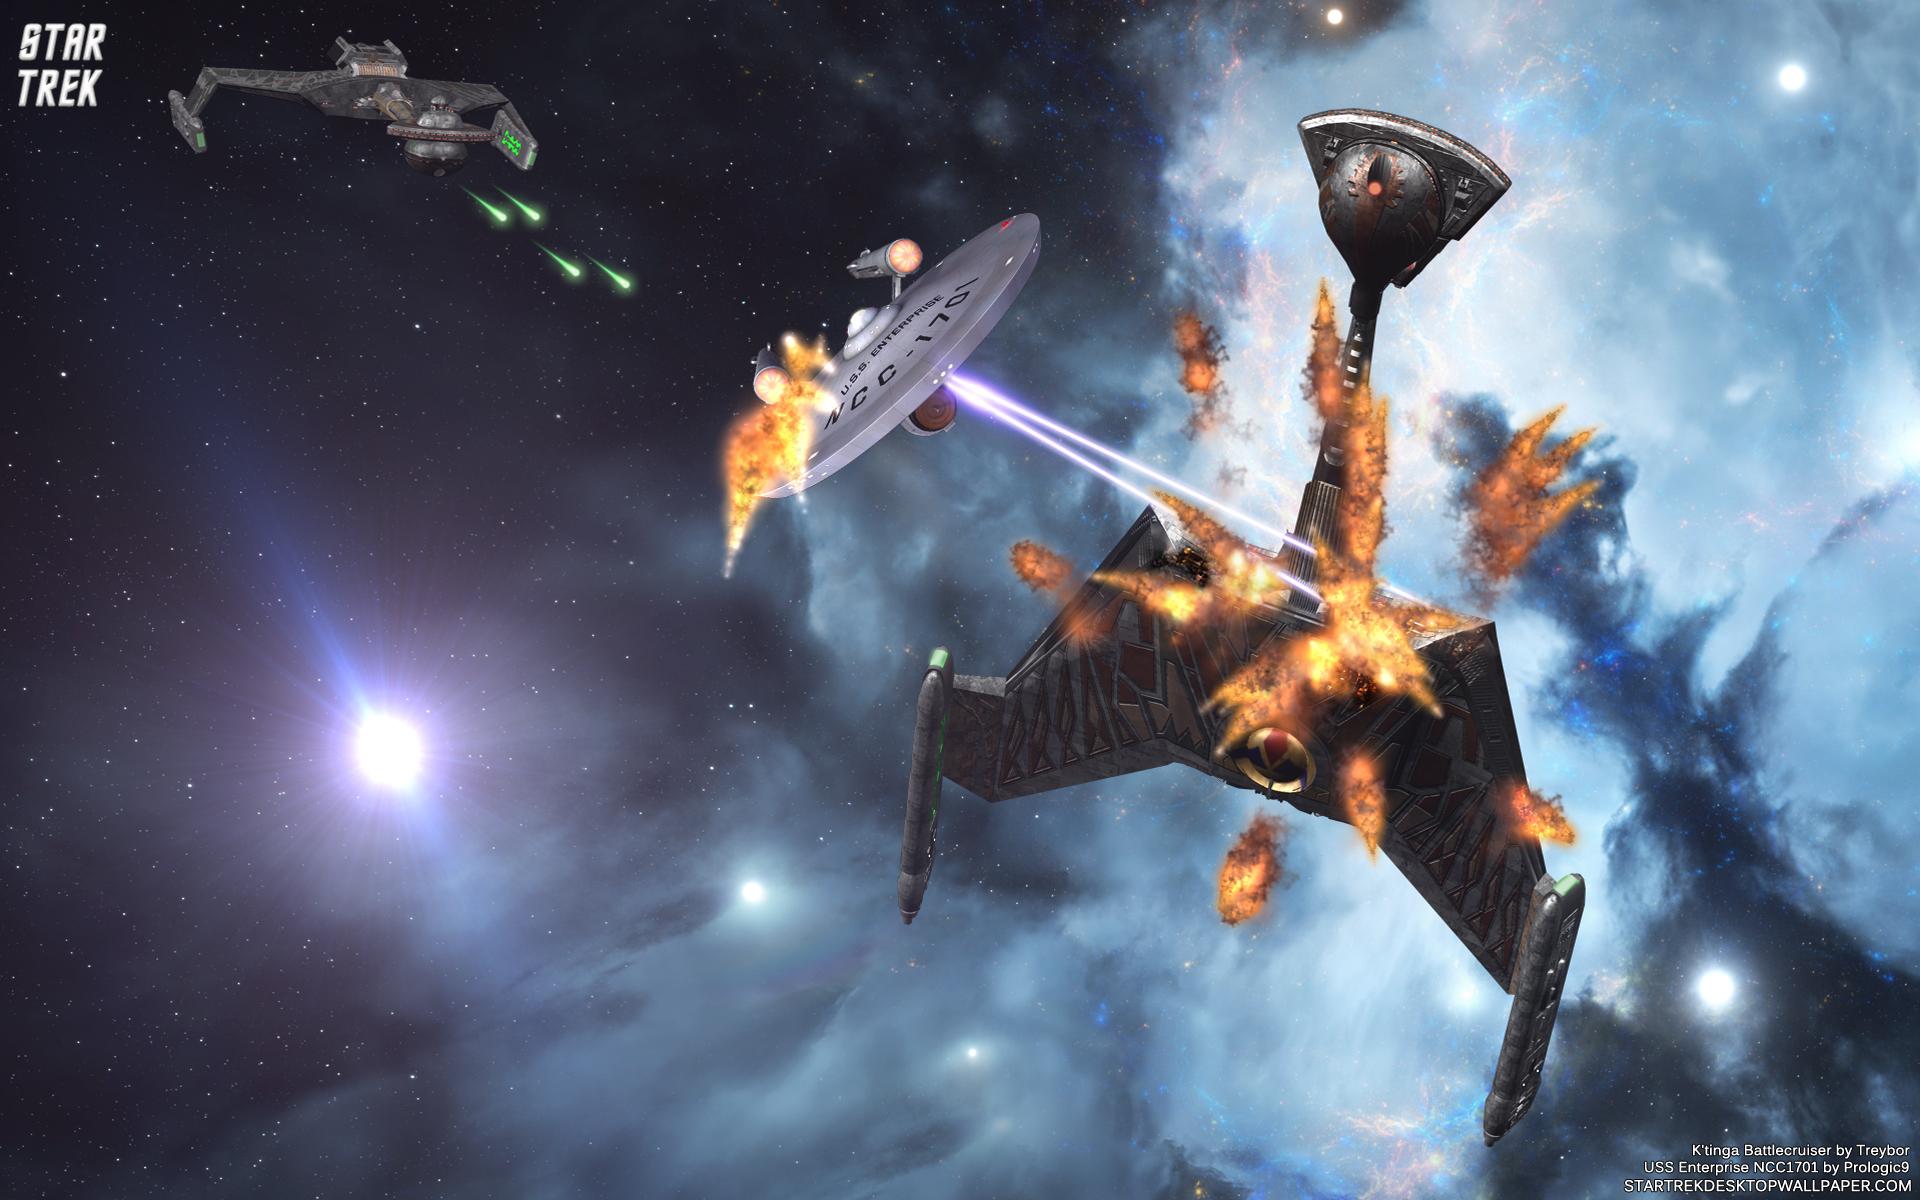 Resolution 1920x1200 Star Trek Space Battle USS Enterprise 1701 1920x1200